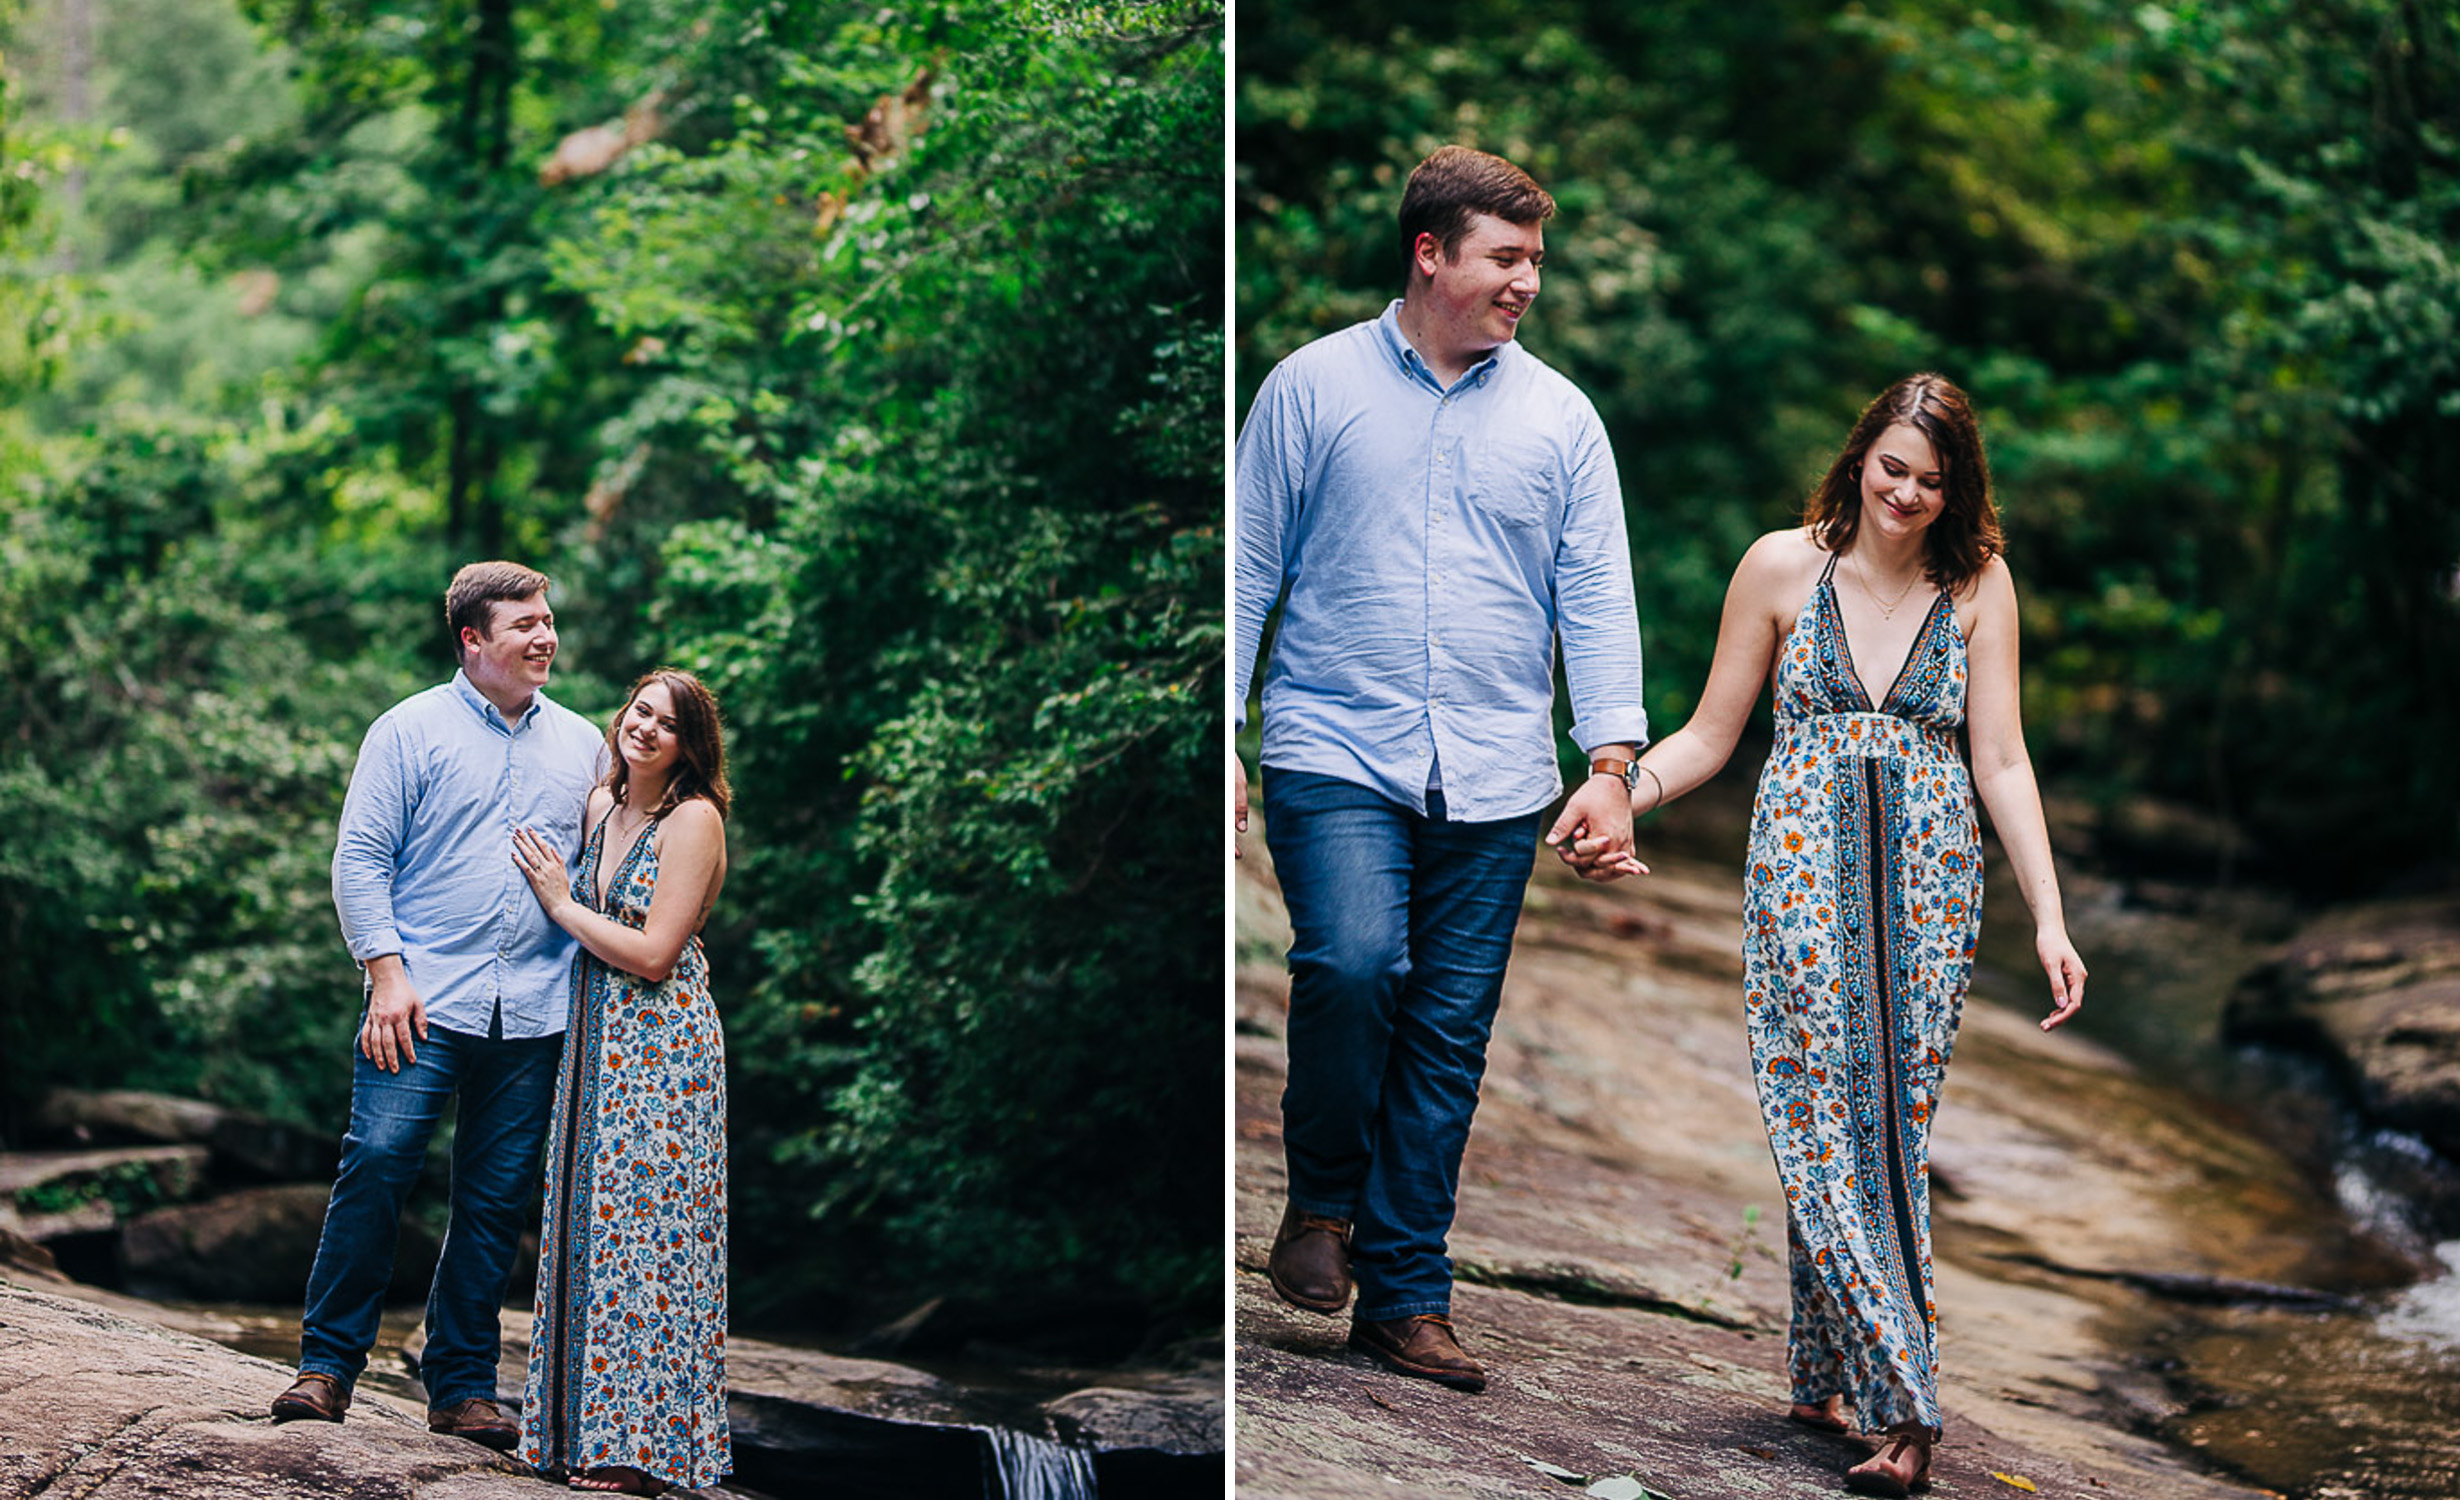 River Engagement Portraits, Summer Engagement Portraits, Engaged, South Carolina 09.jpg